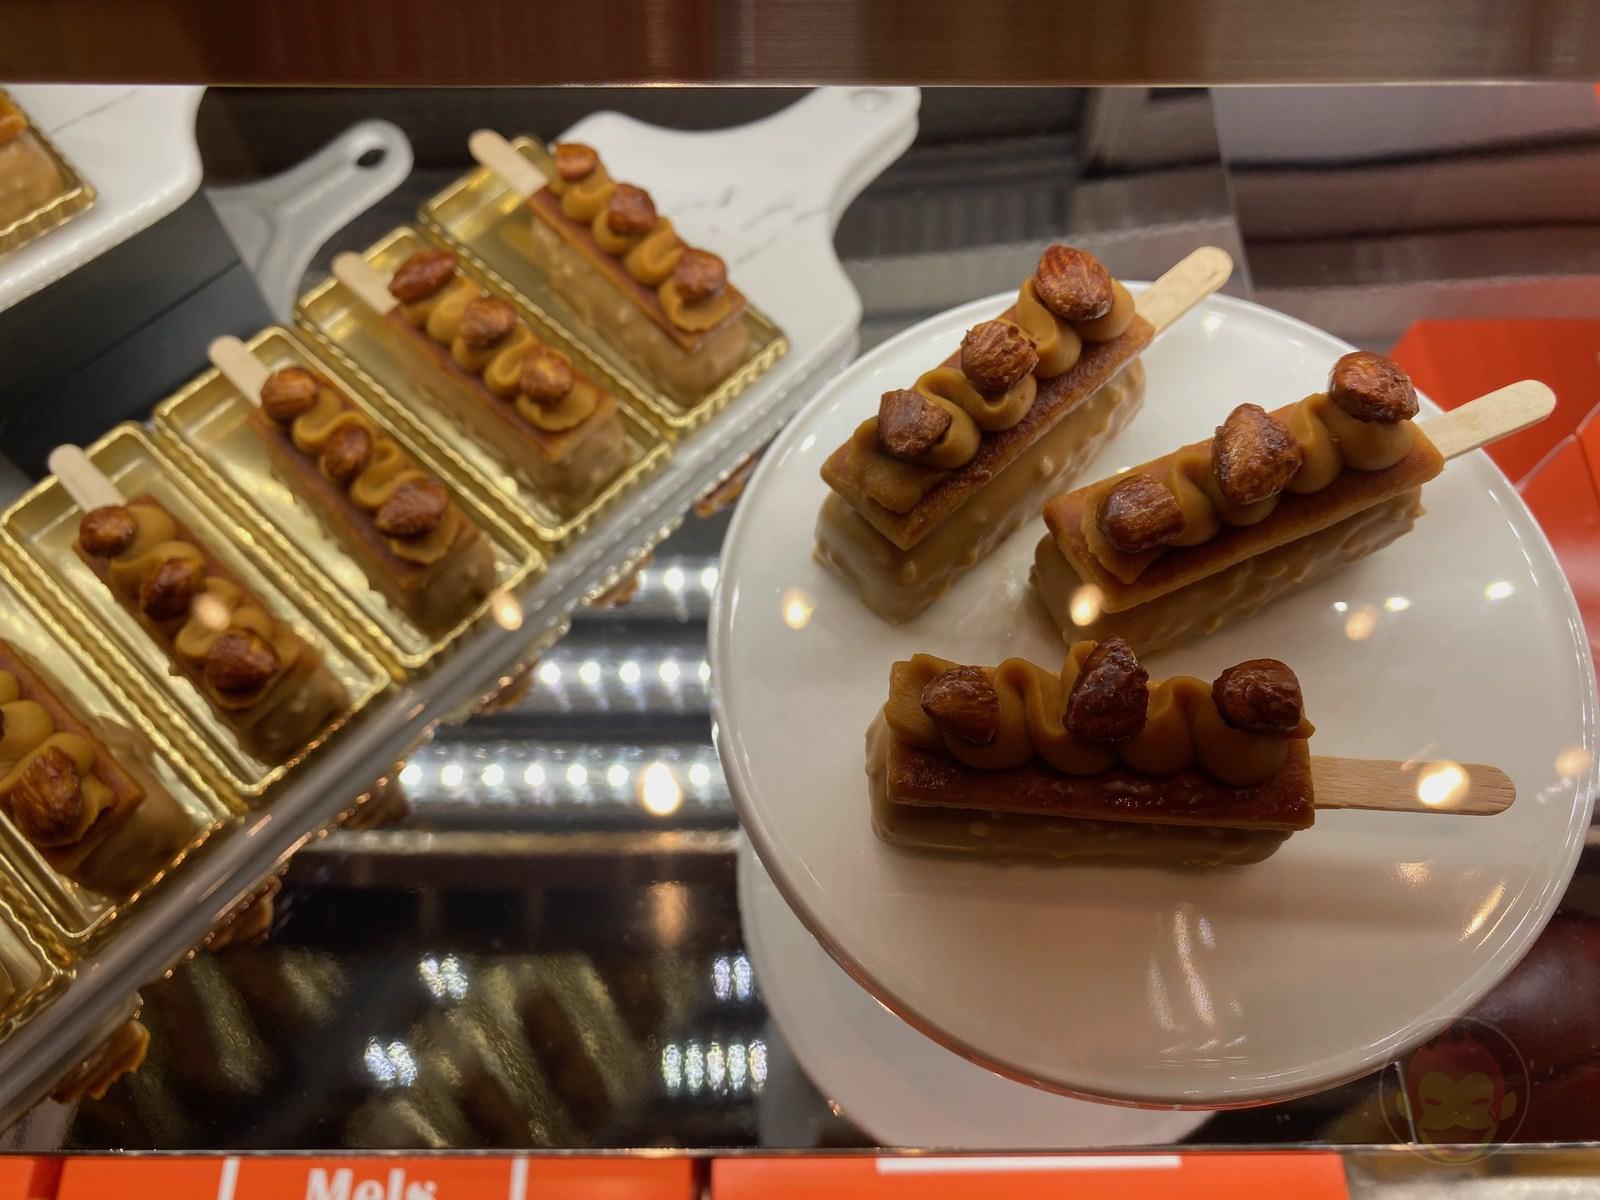 Shibuya-Scramble-Square-Food-I-Ate-87.jpeg